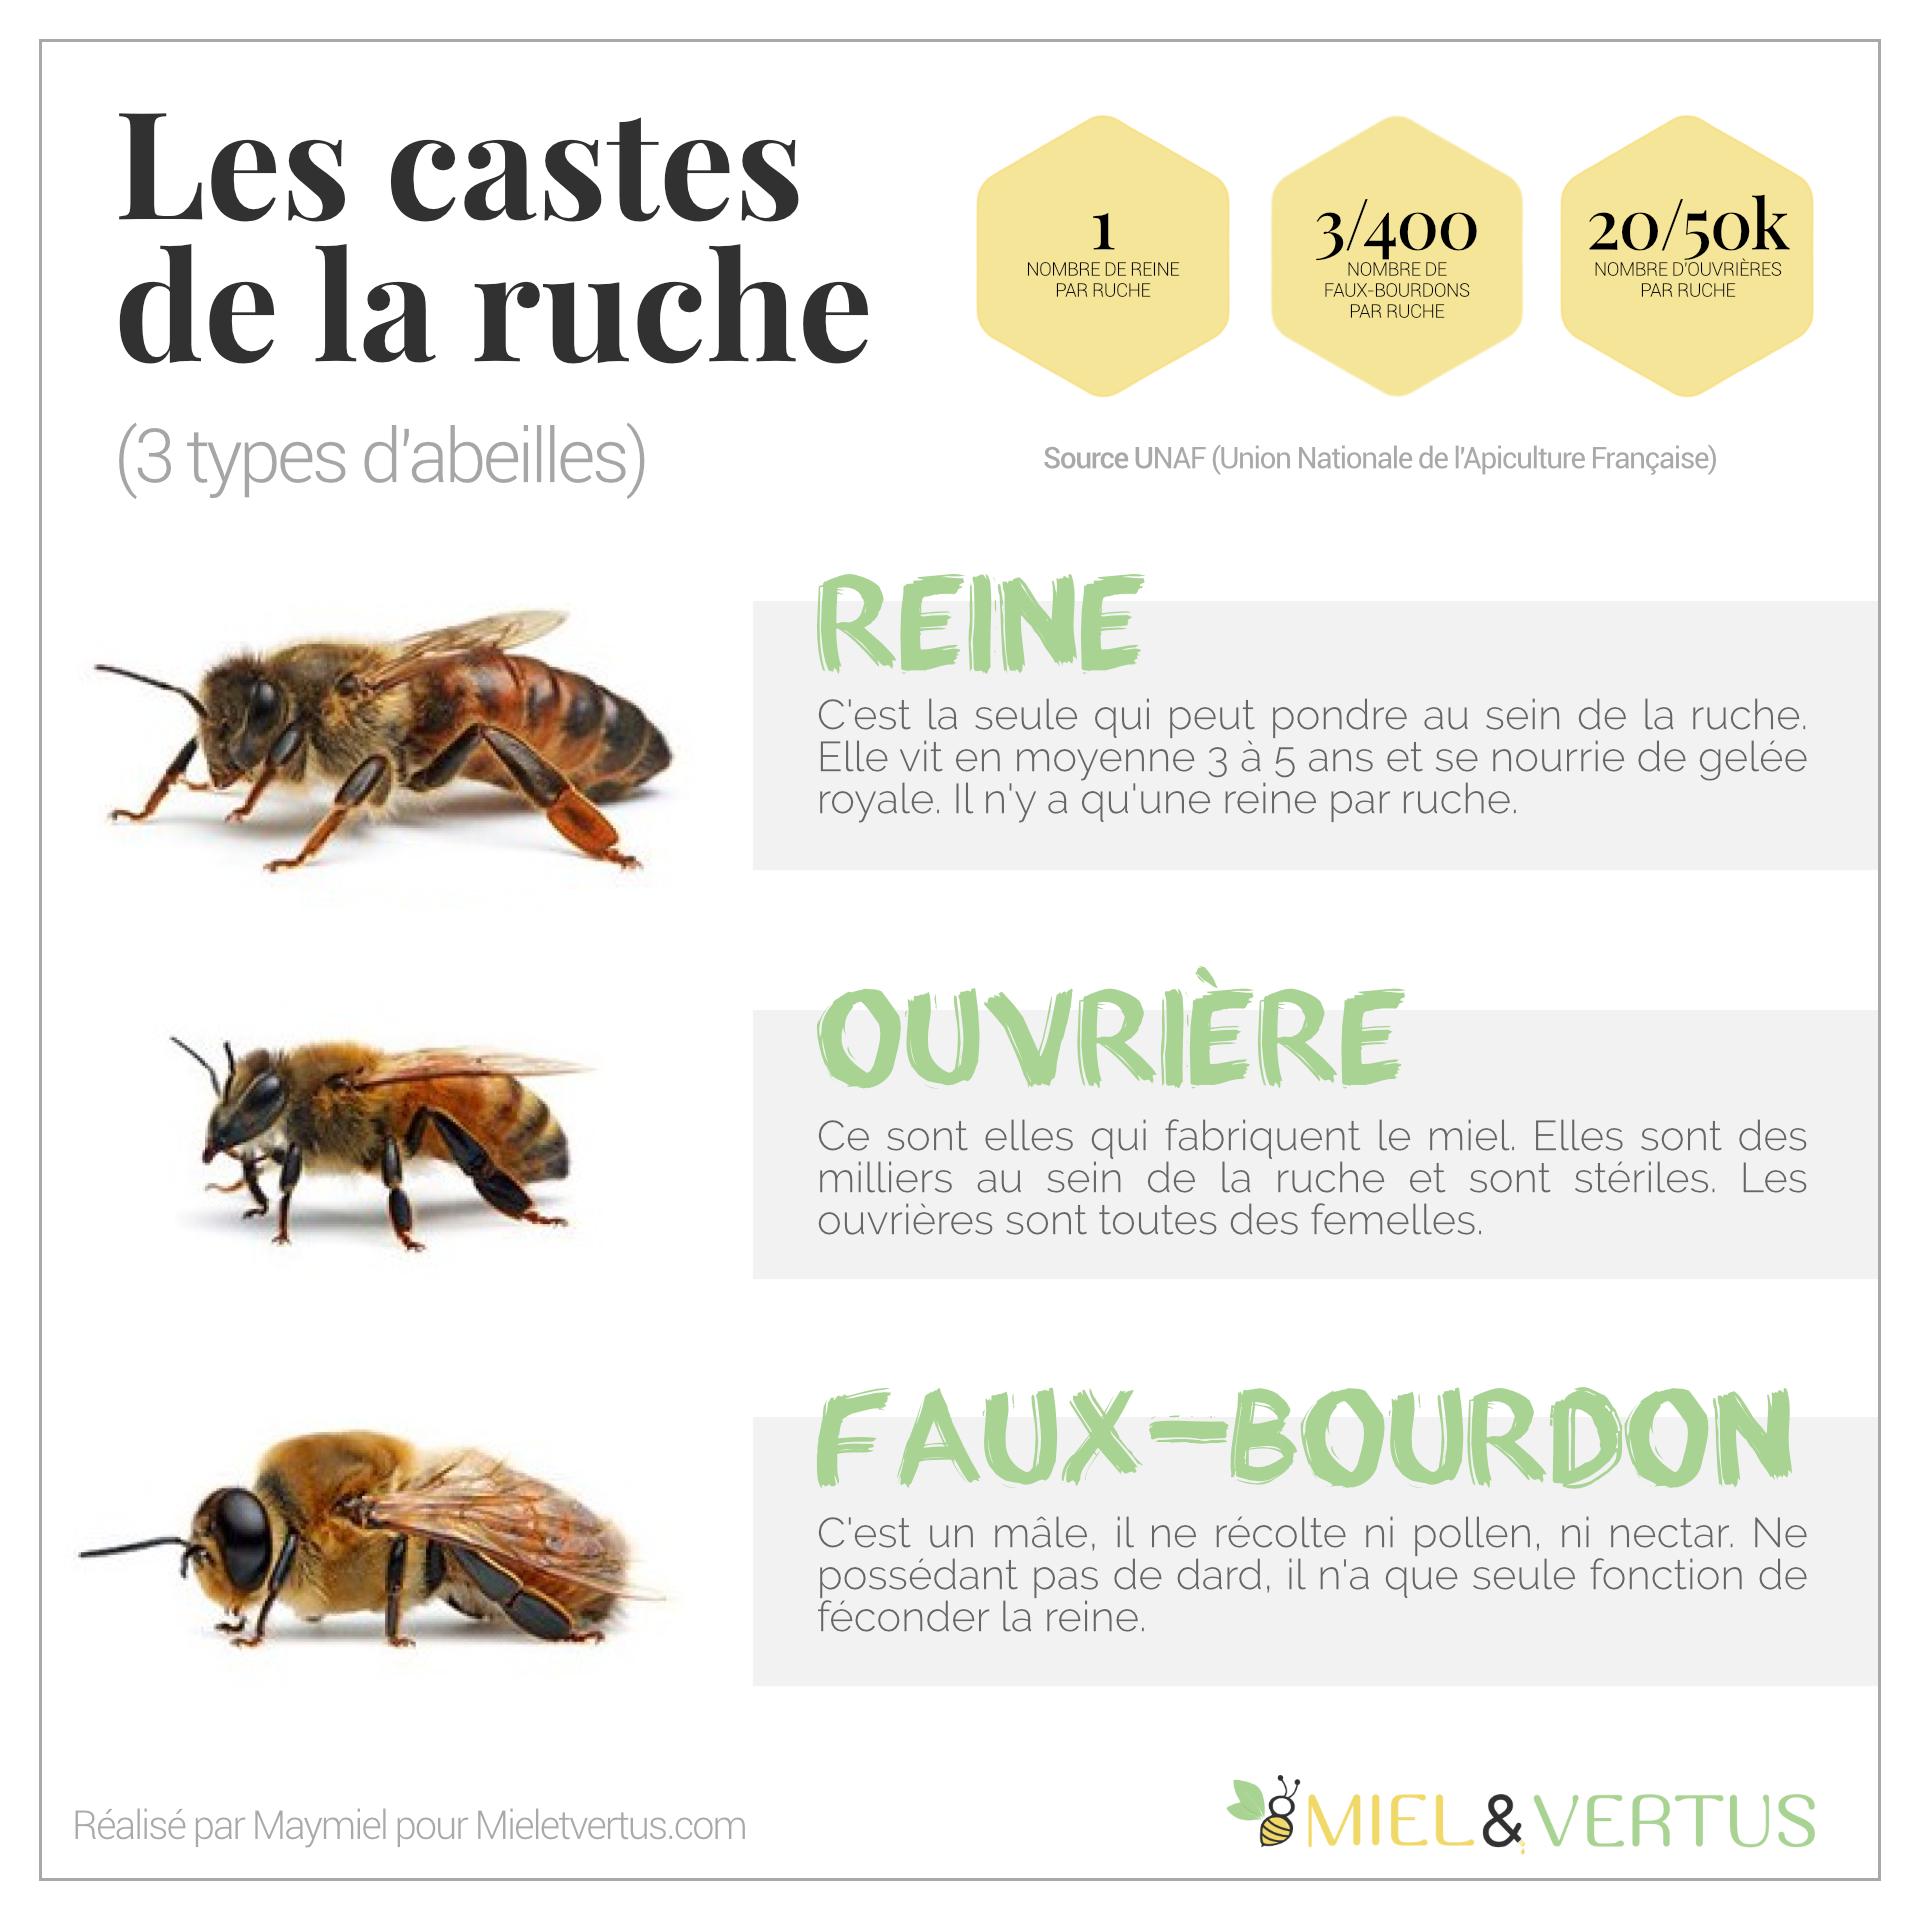 Les castes de la ruche